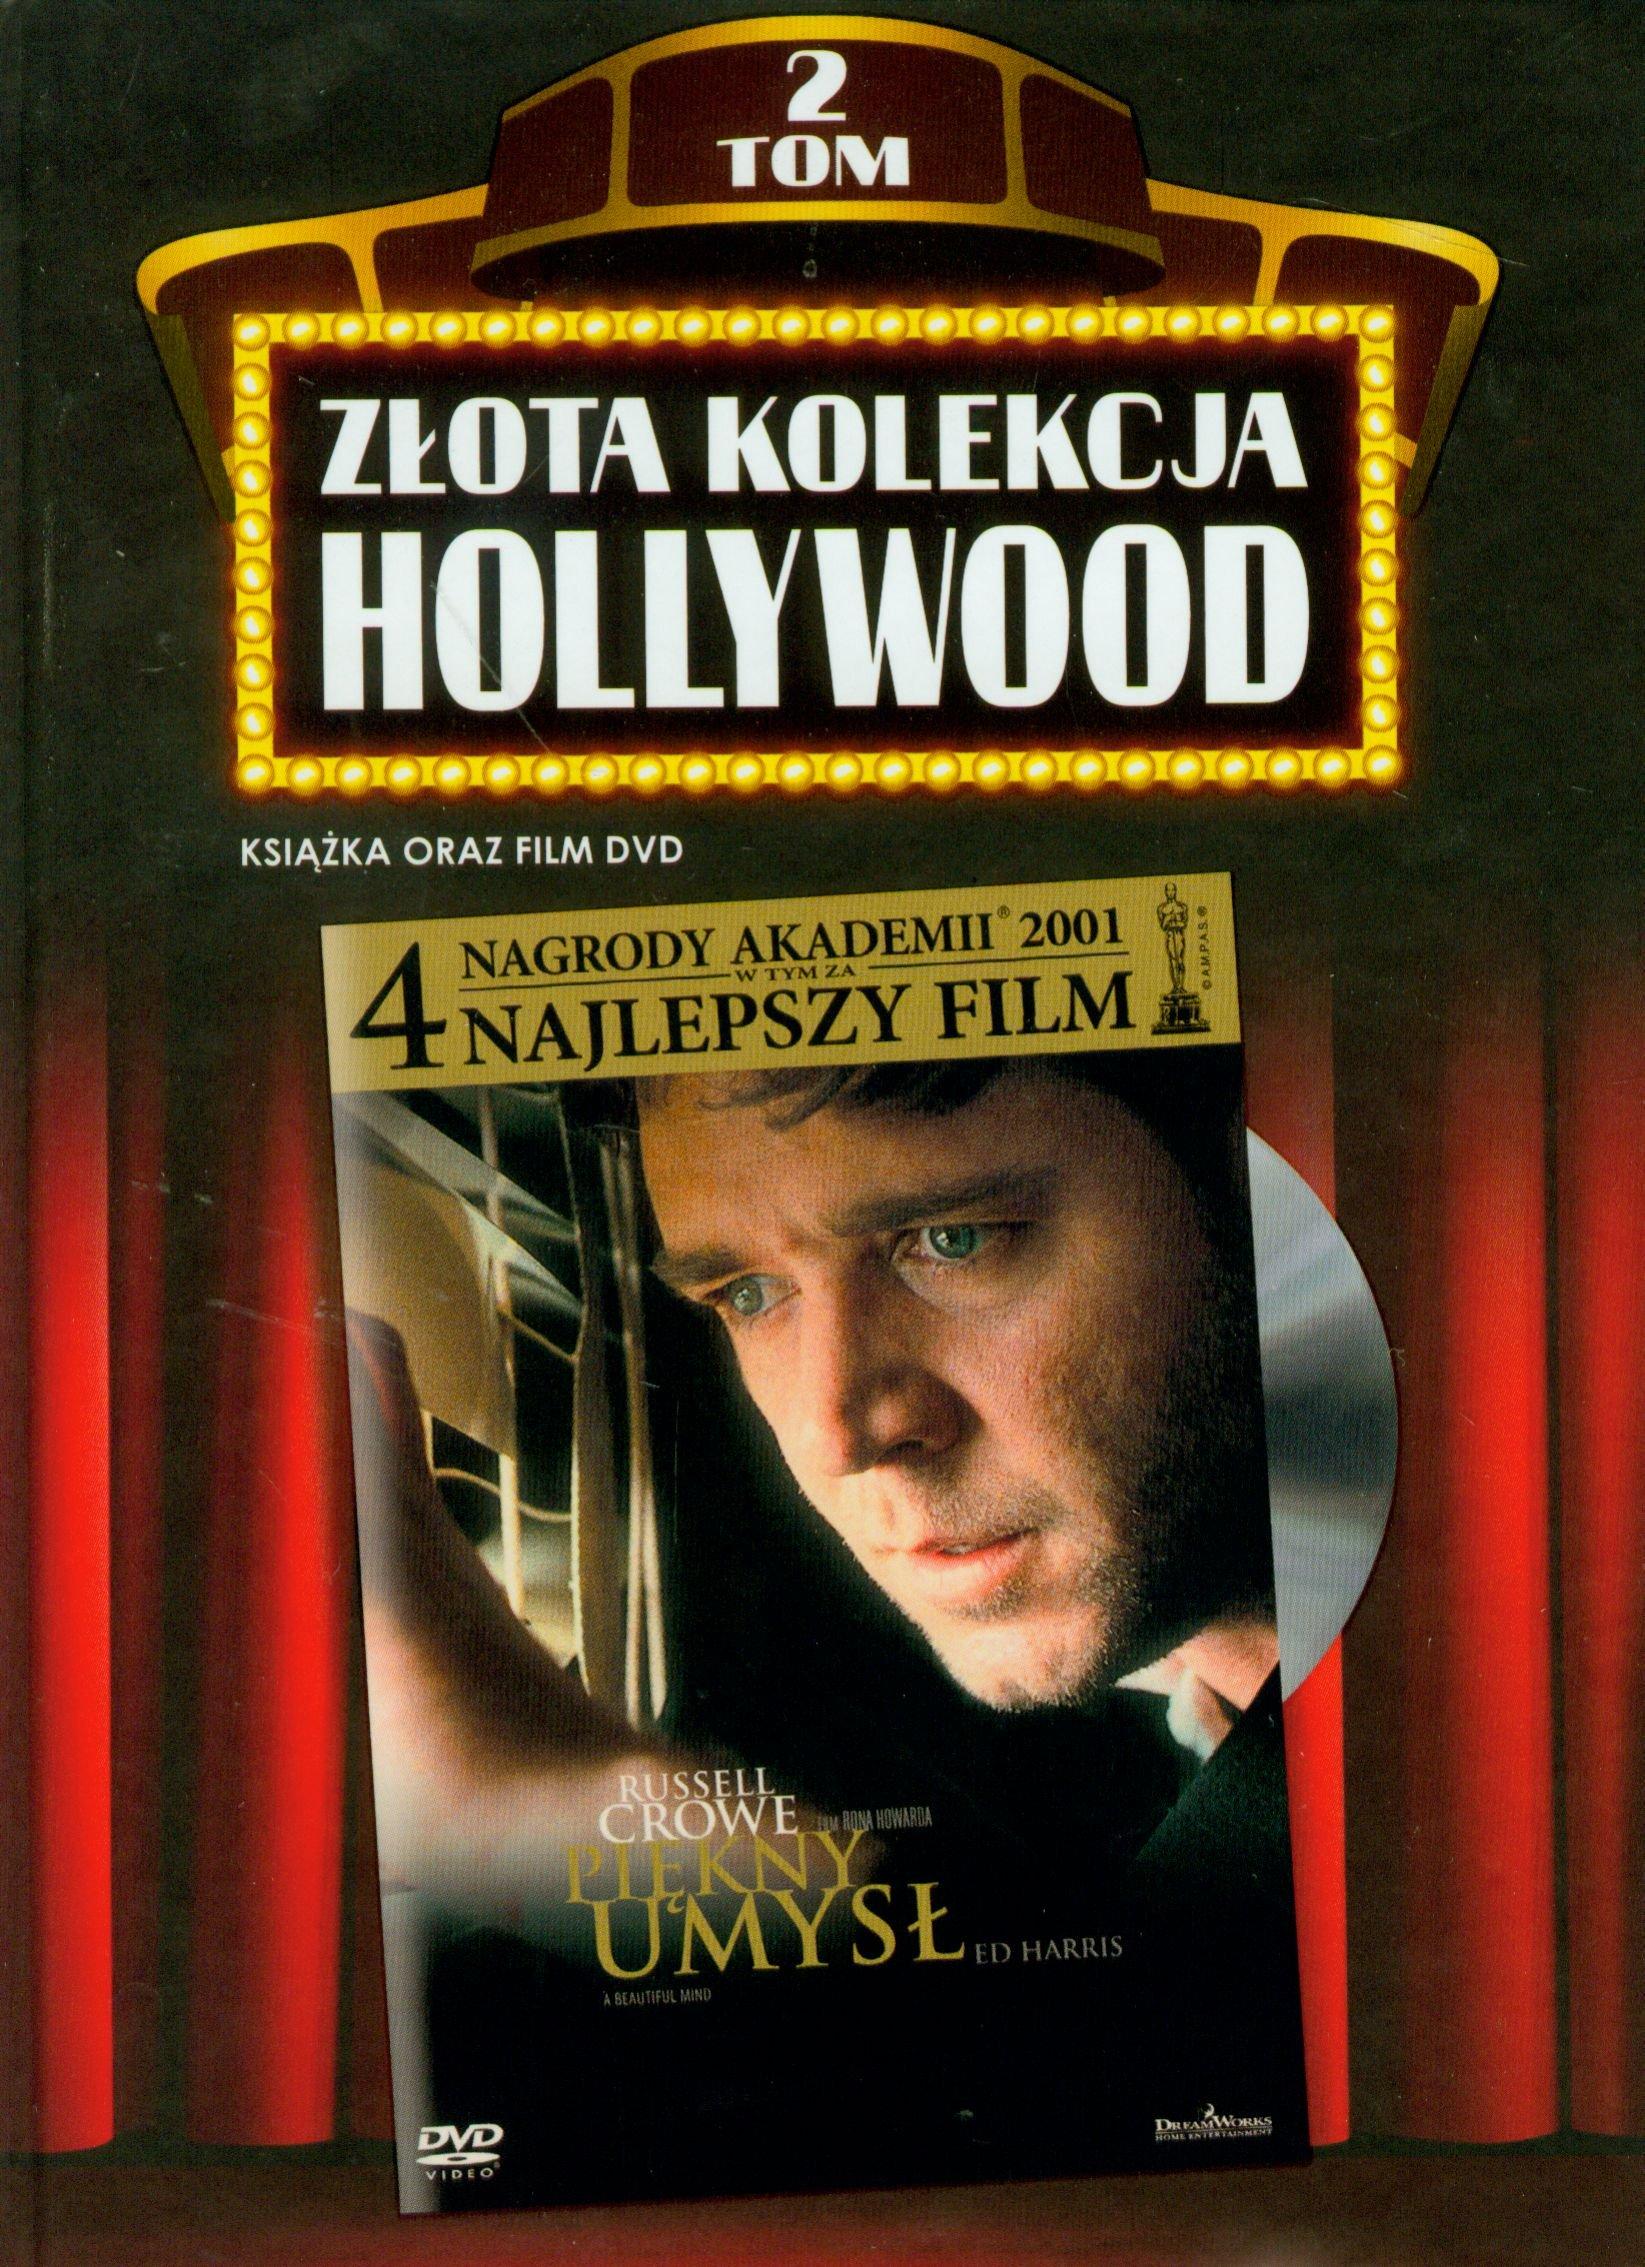 Zlota kolekcja Hollywood 2 Piekny umysl: Amazon.es: Russell ...